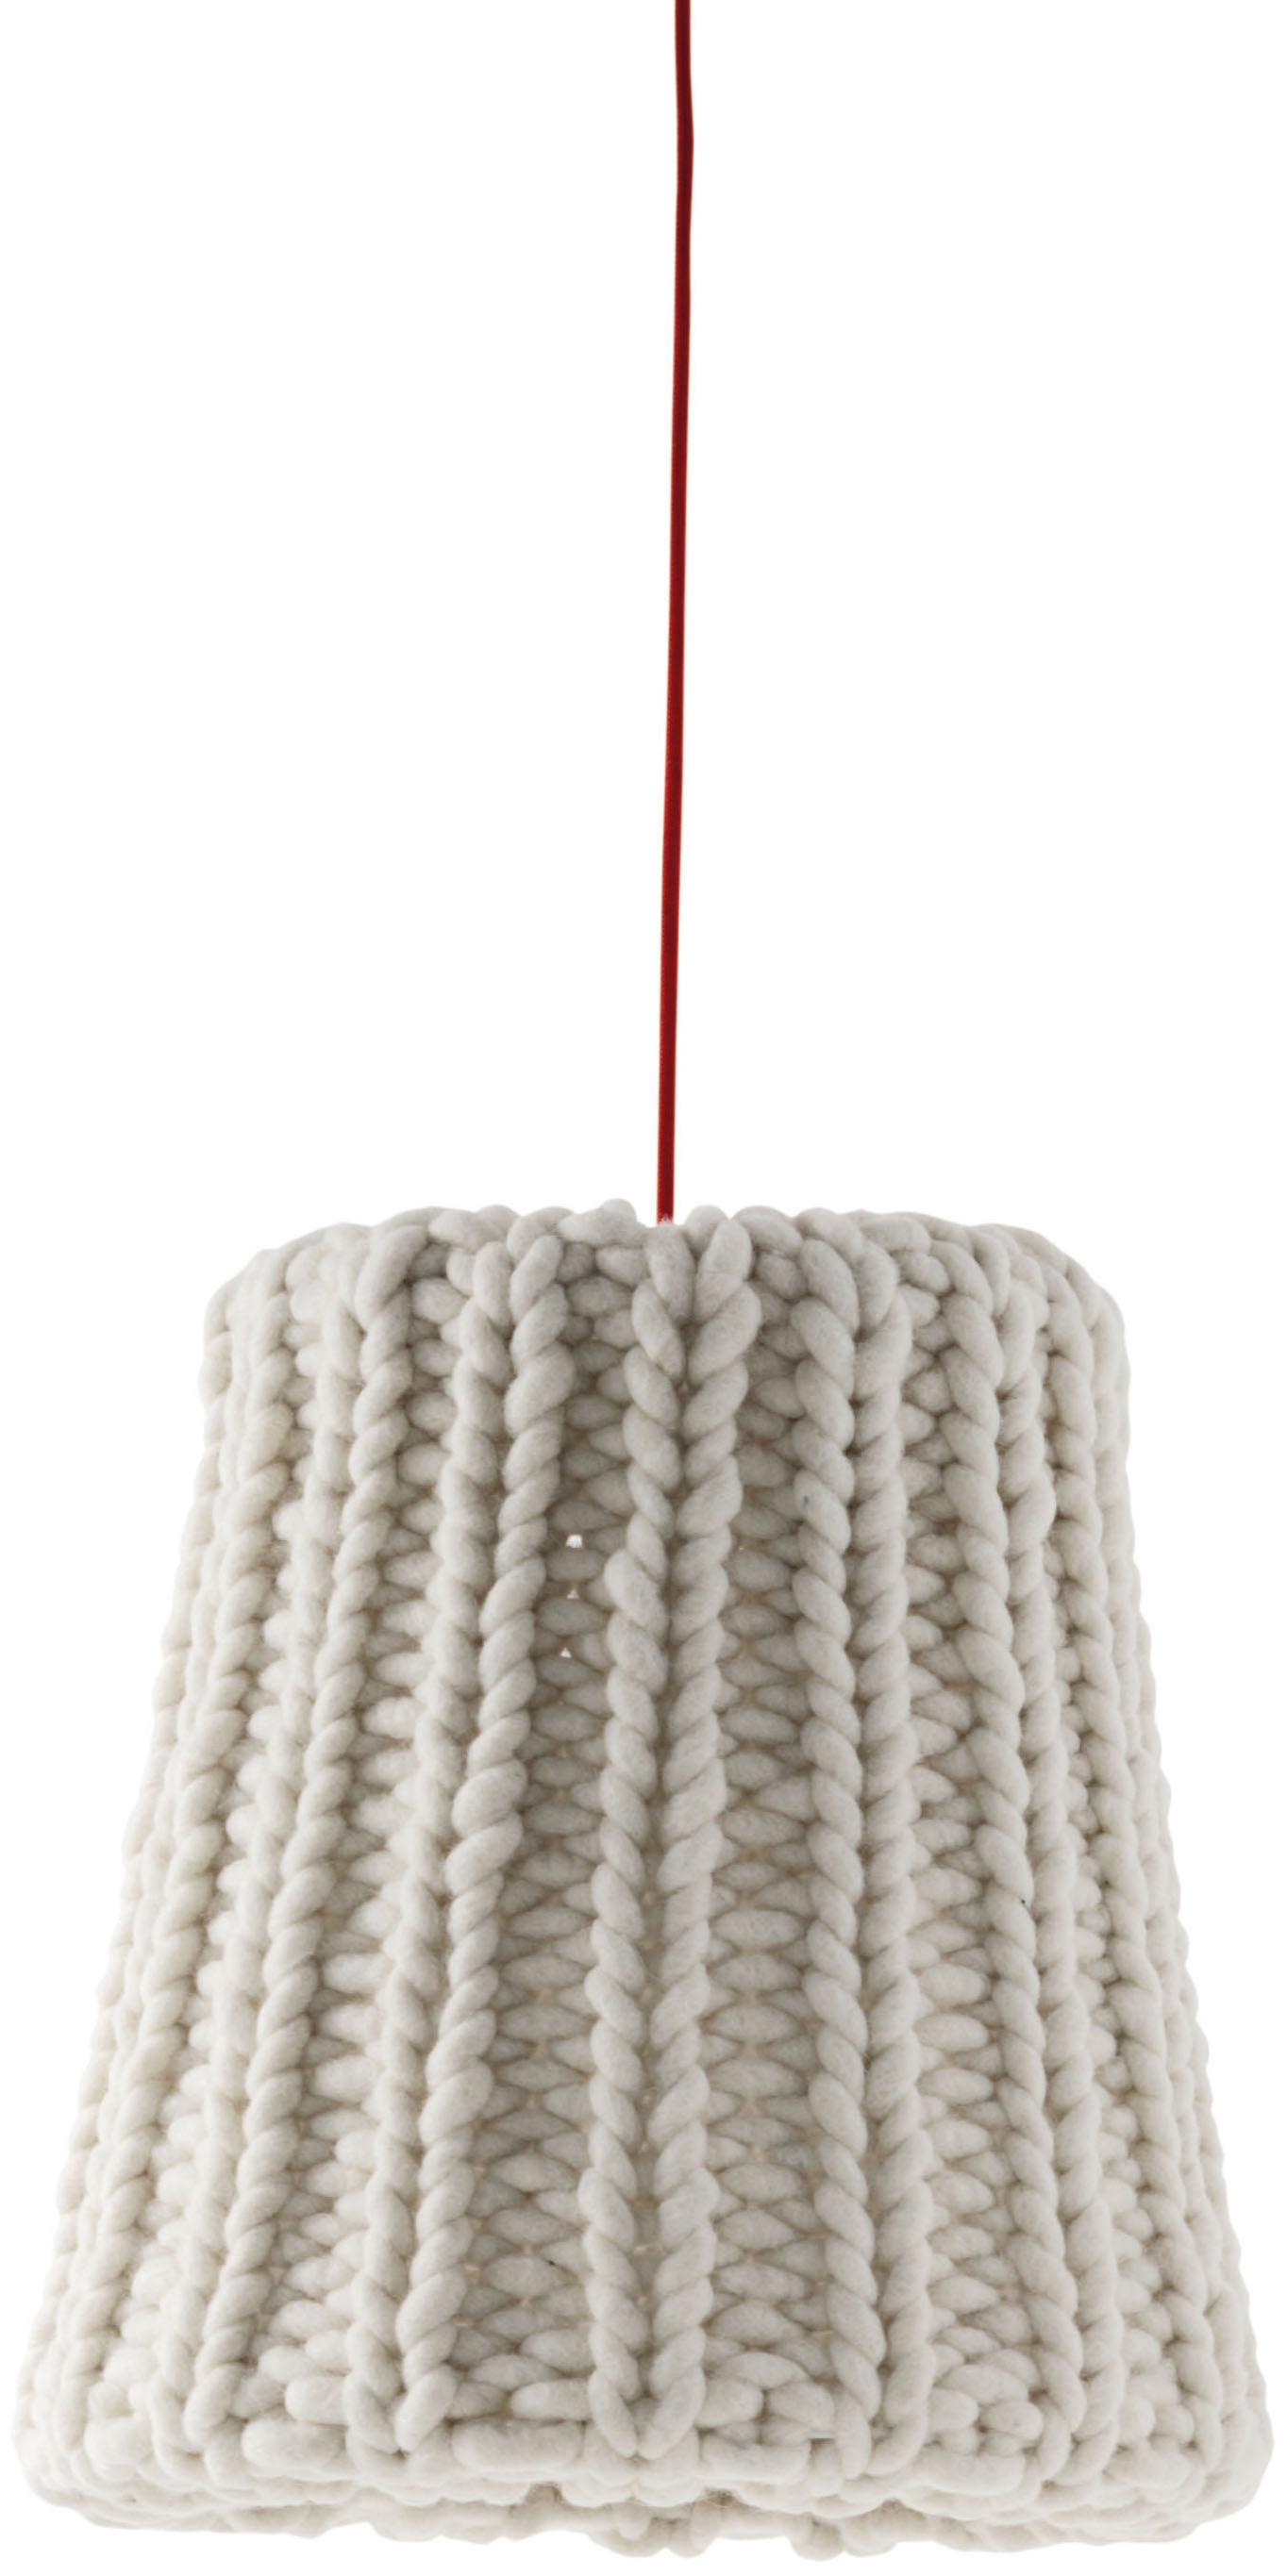 Lighting - Pendant Lighting - Granny Large Pendant by Casamania - Off white-ecru - Wool